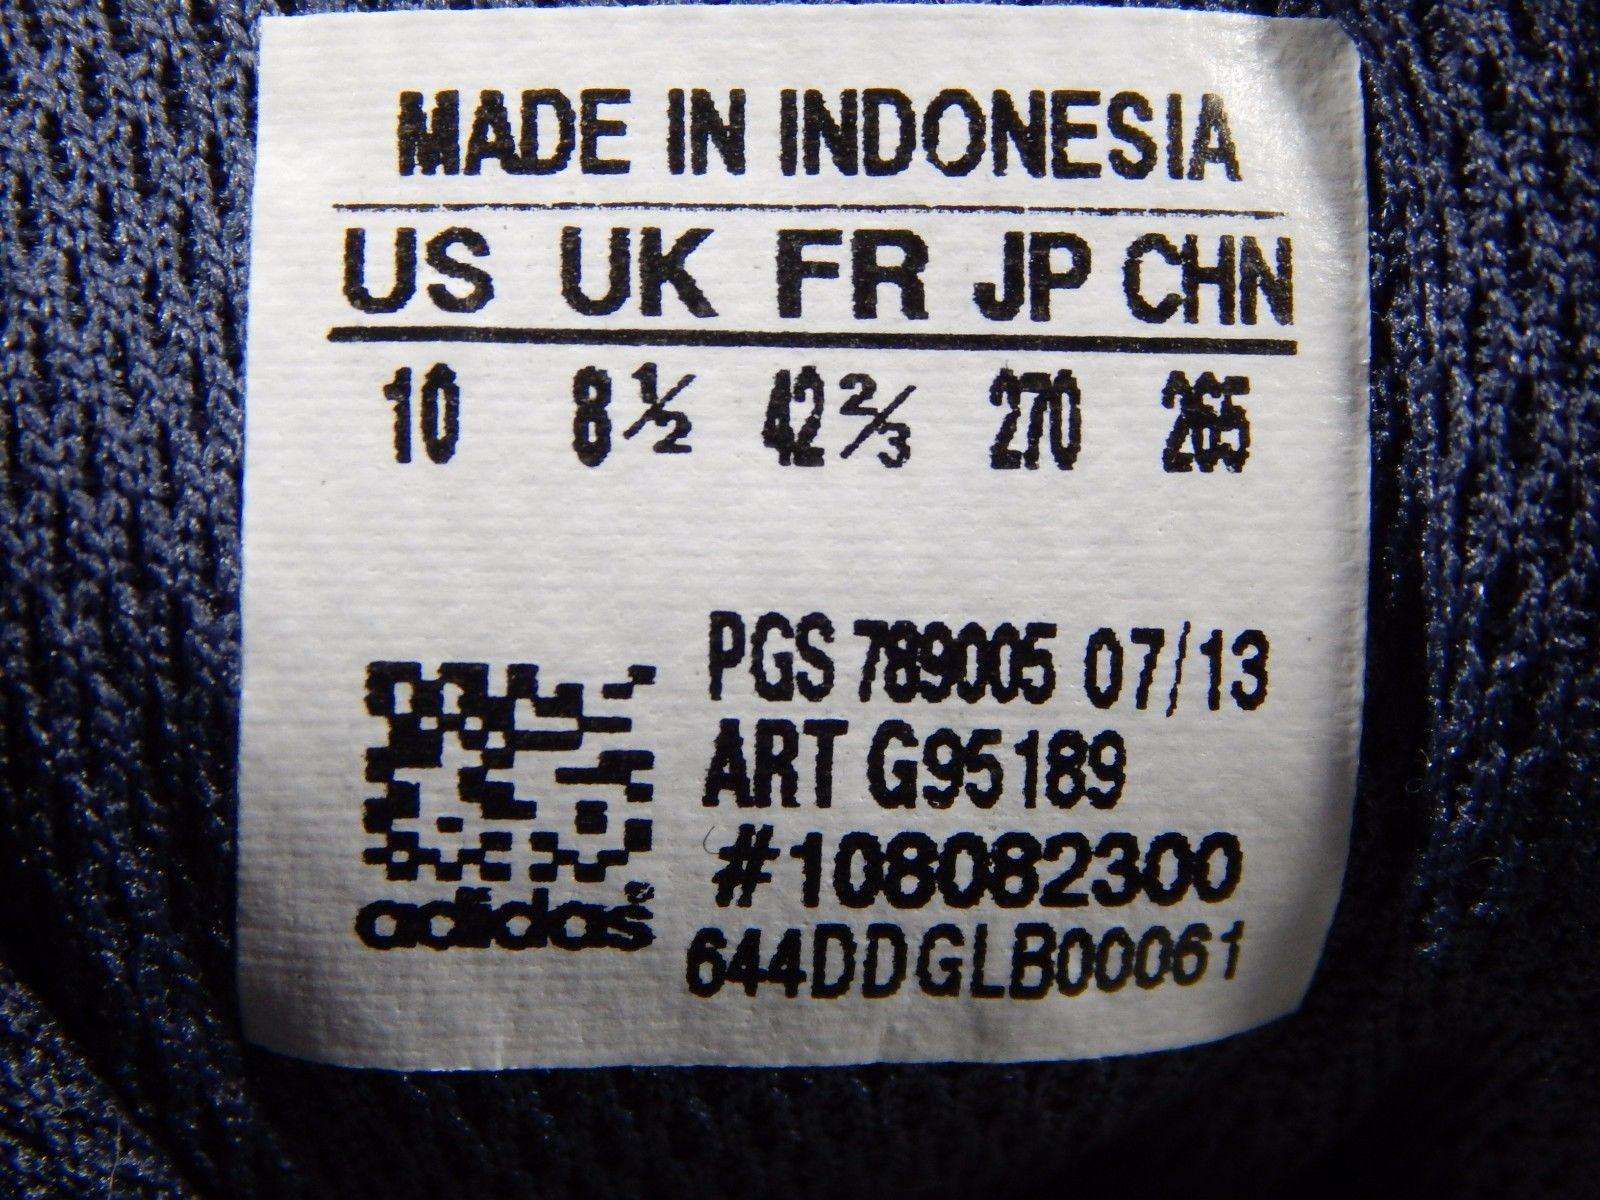 Adidas Essential Star 2 Women's Running Shoes Size US 10 M (B) EU 42/ 2/3 G95189